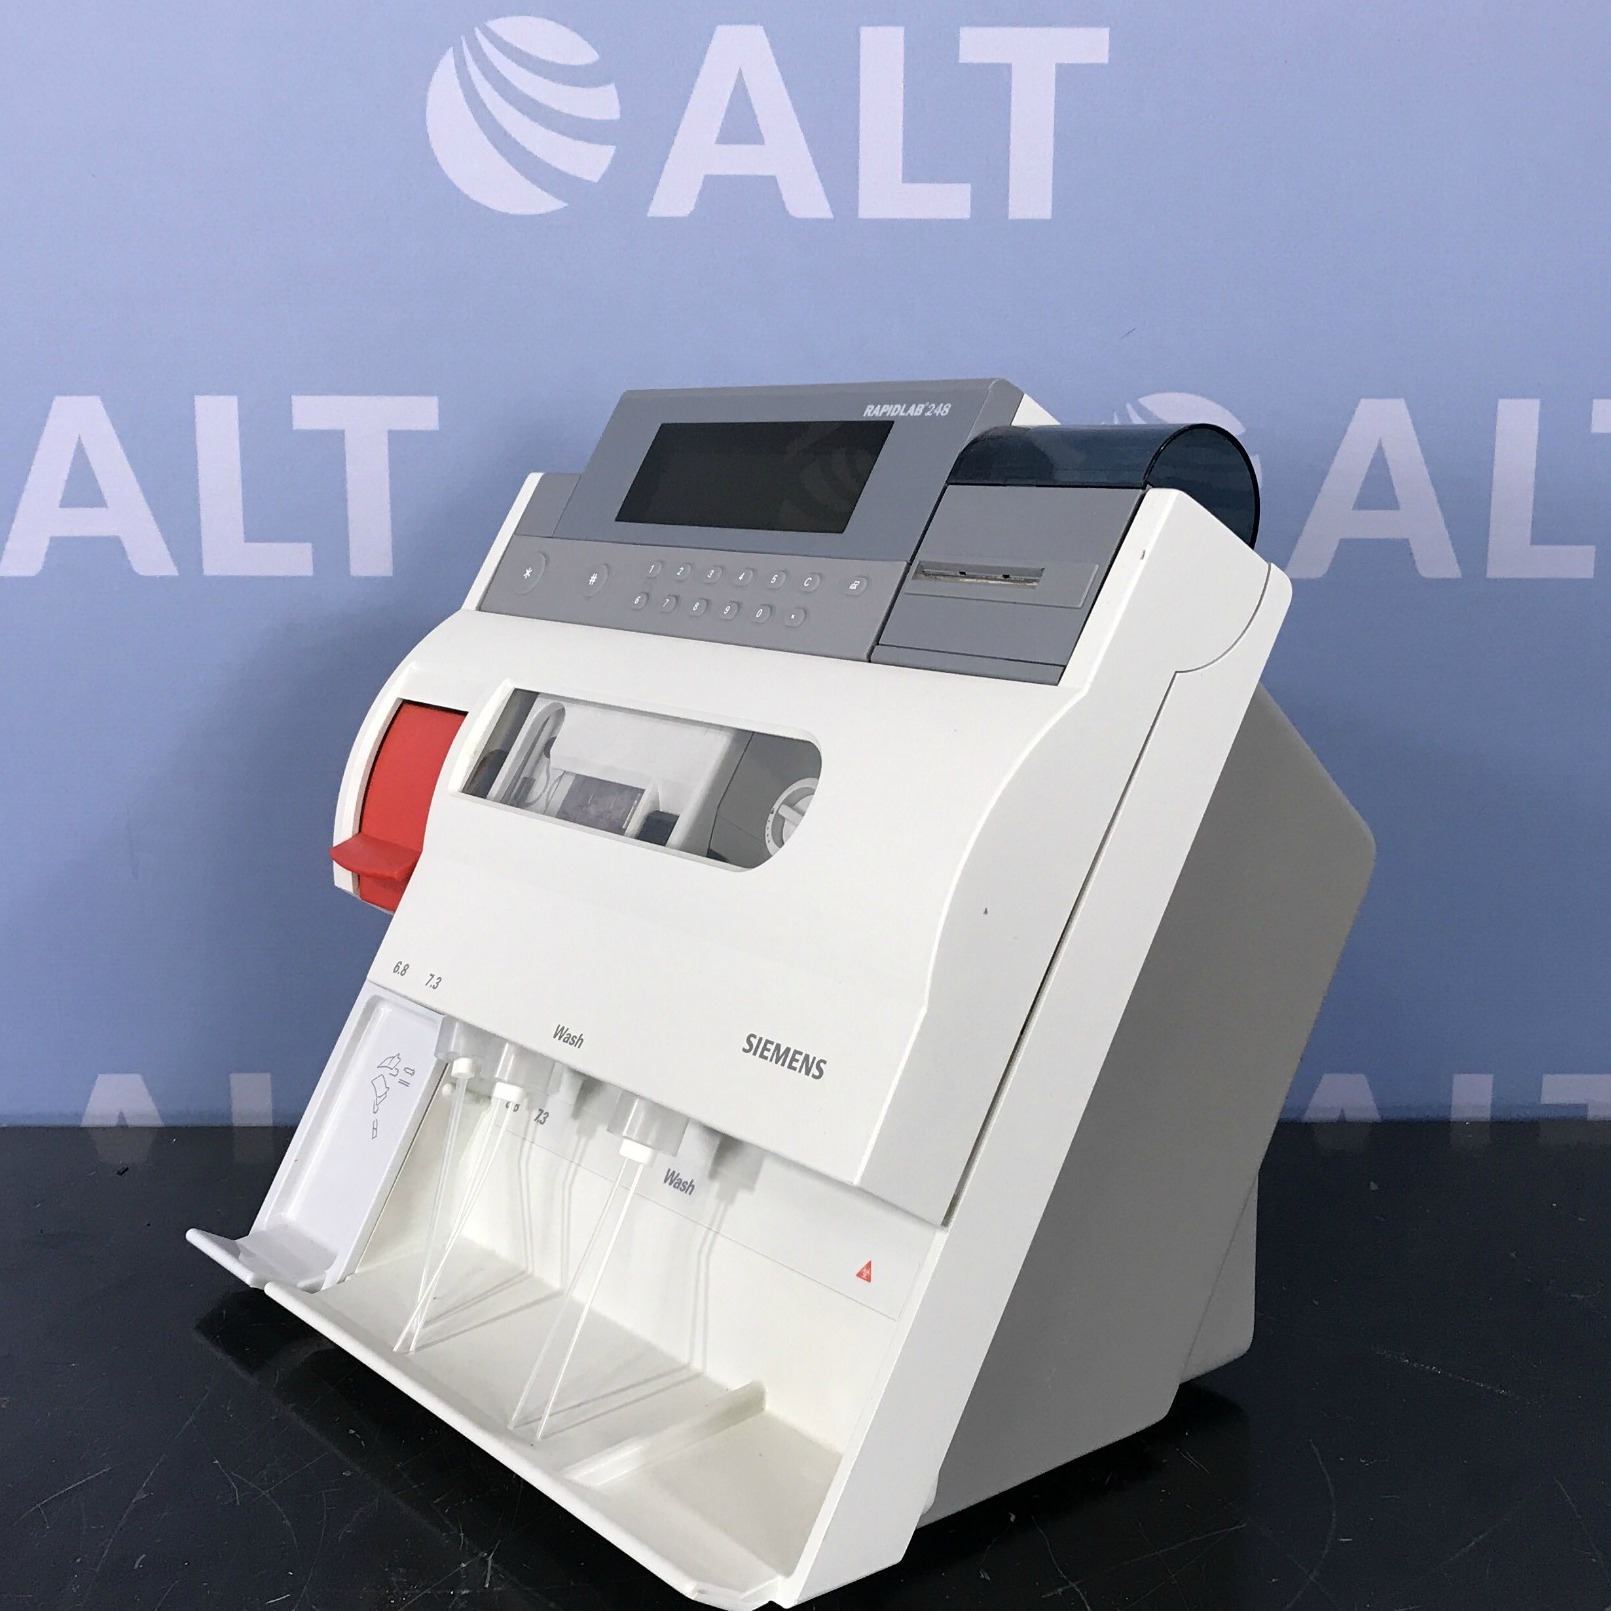 Siemens RabidLab 248 Model 240 pH/Blood Gas Analyzer Image